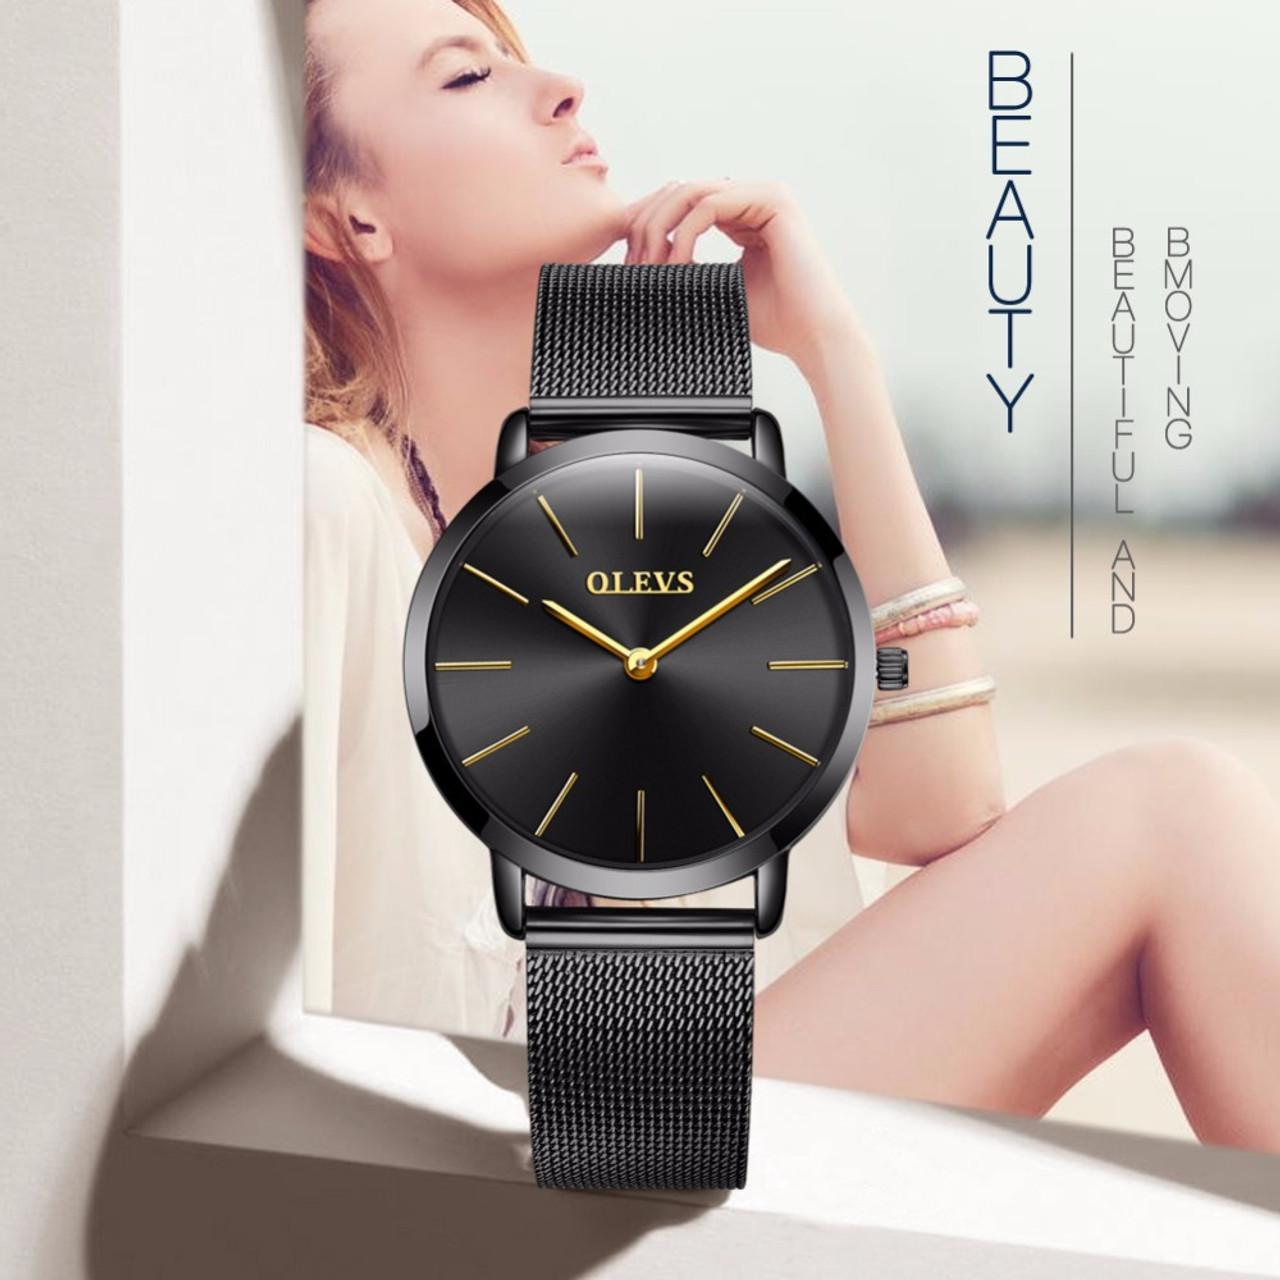 Women Watches Luxury Olevs Brand Fashion Quartz Ladies Watch Clock Rose Gold Dress Casual Girl Relogio Feminino Wristwatch Saat Onshopdeals Com